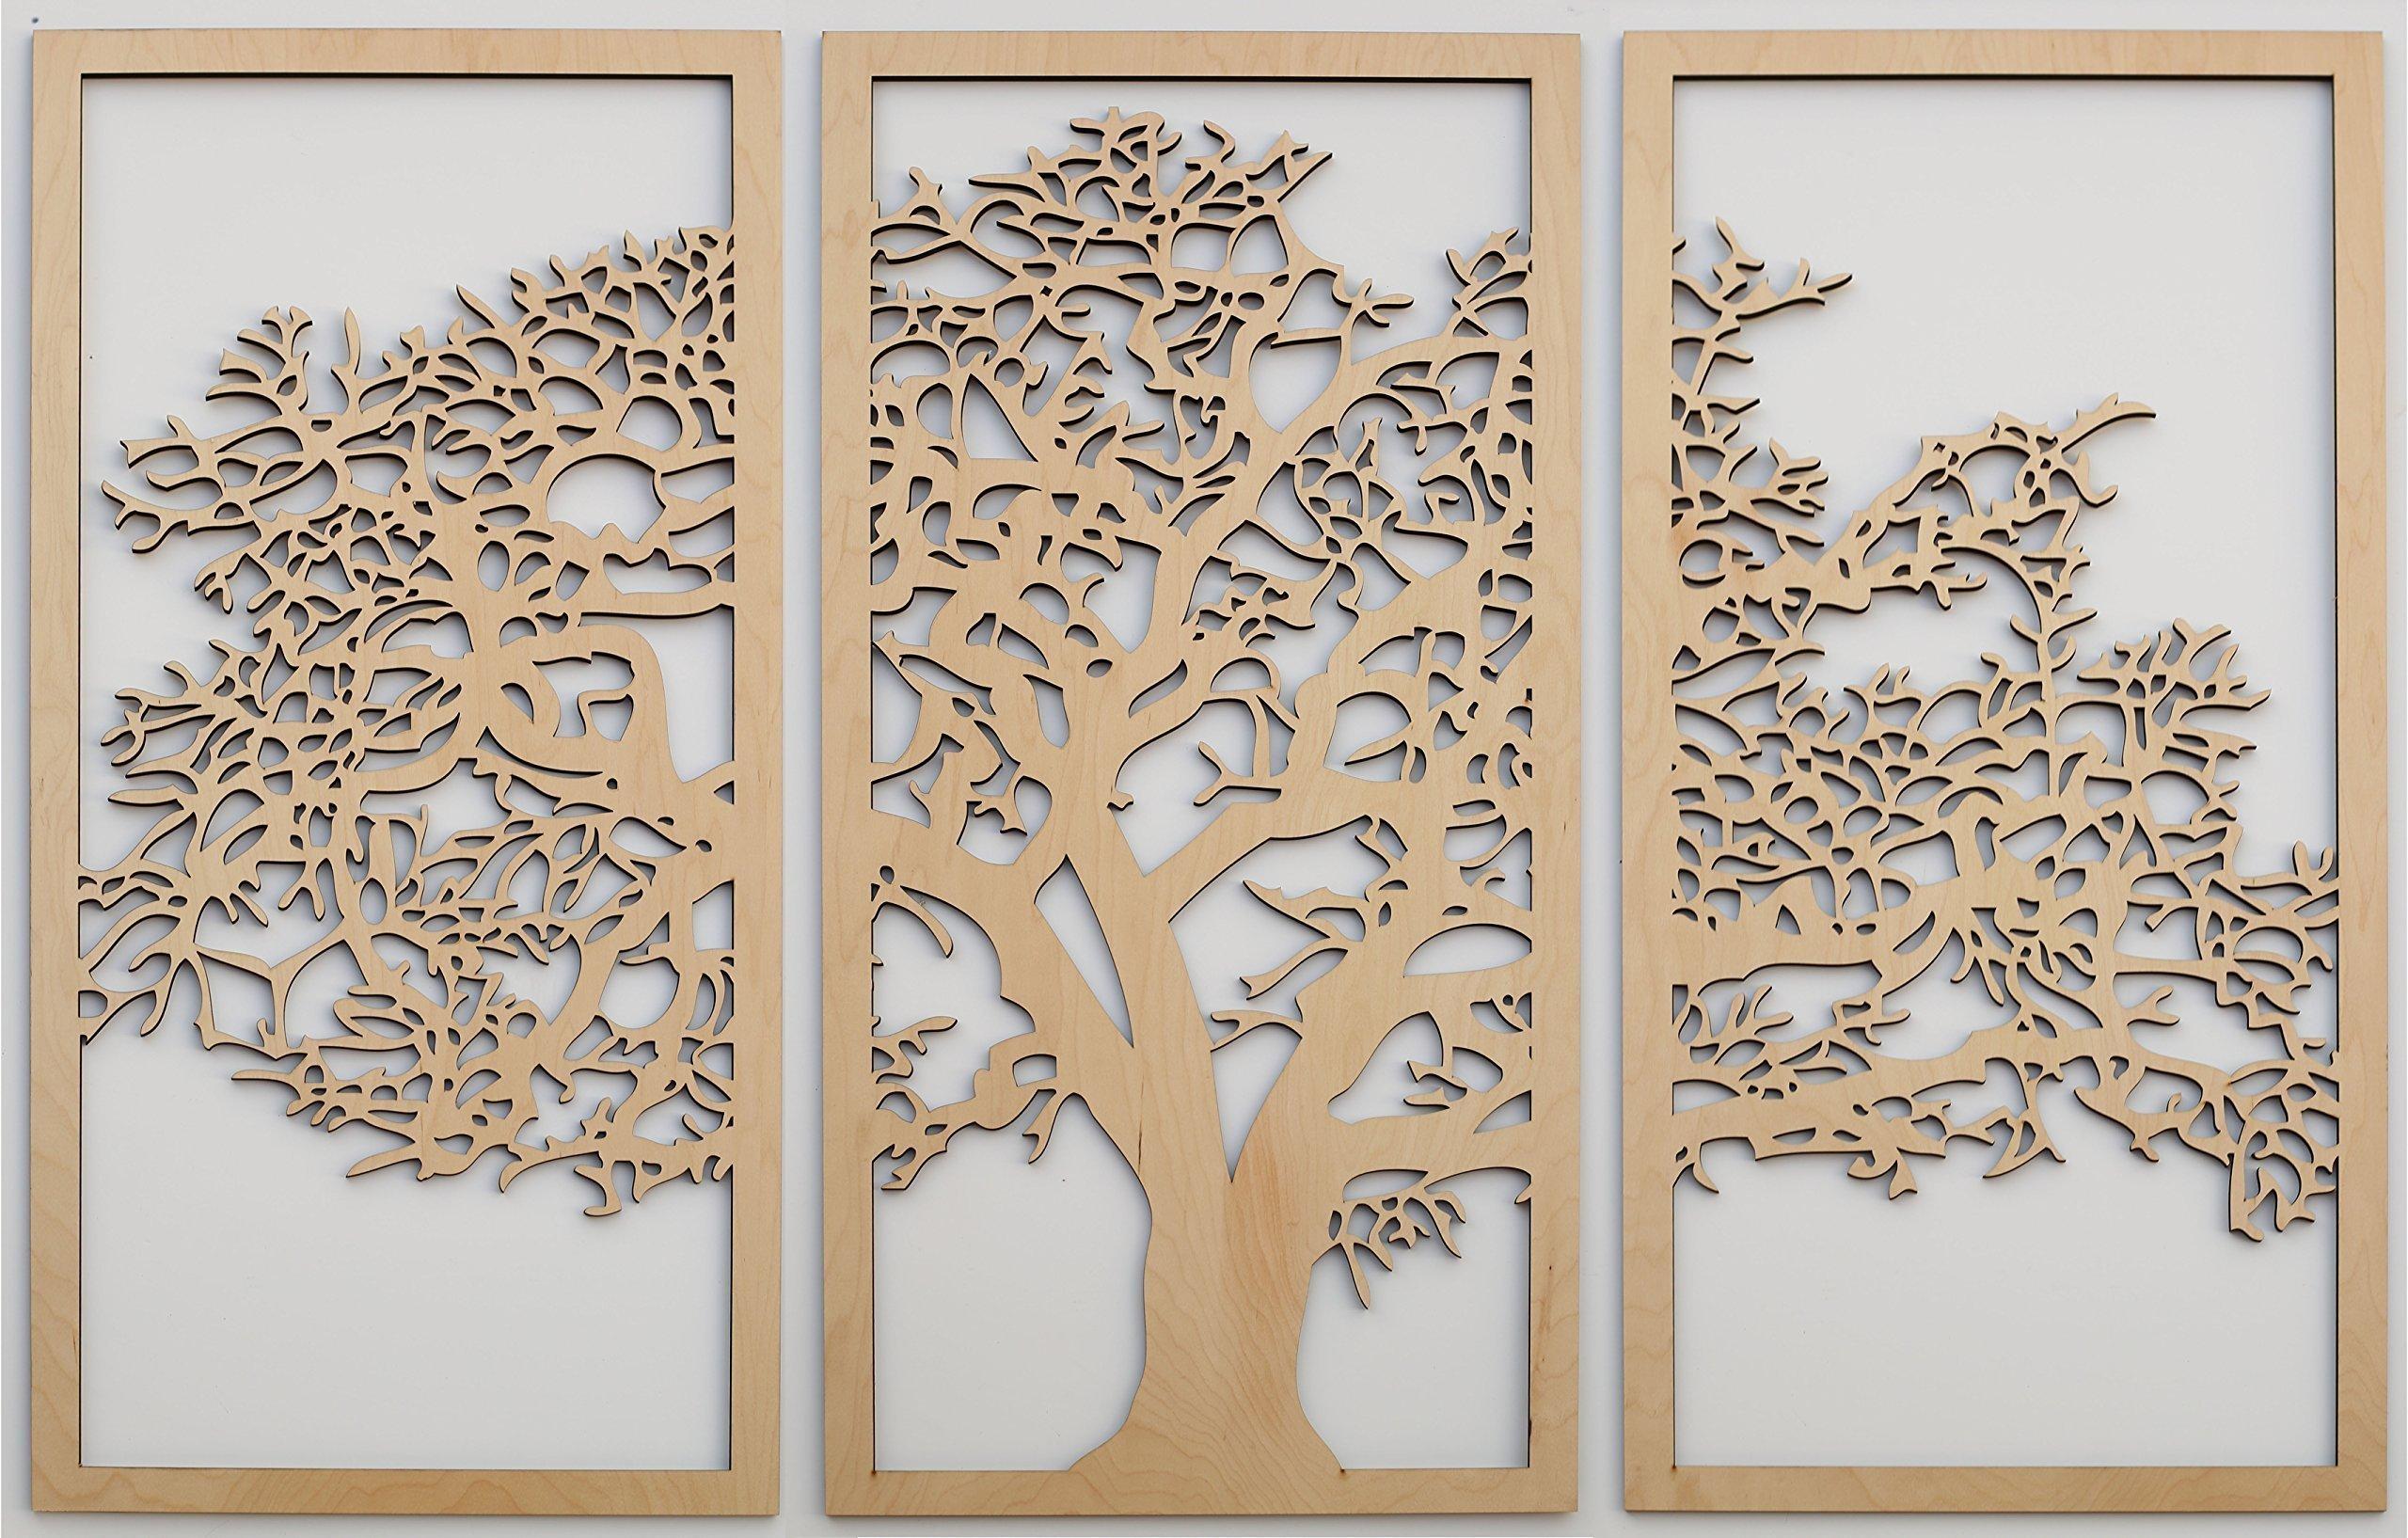 Skyline Workshop Tree of Life 3D Maple - 3 Panel Wood Wall Art - Beautiful Living Room Decor